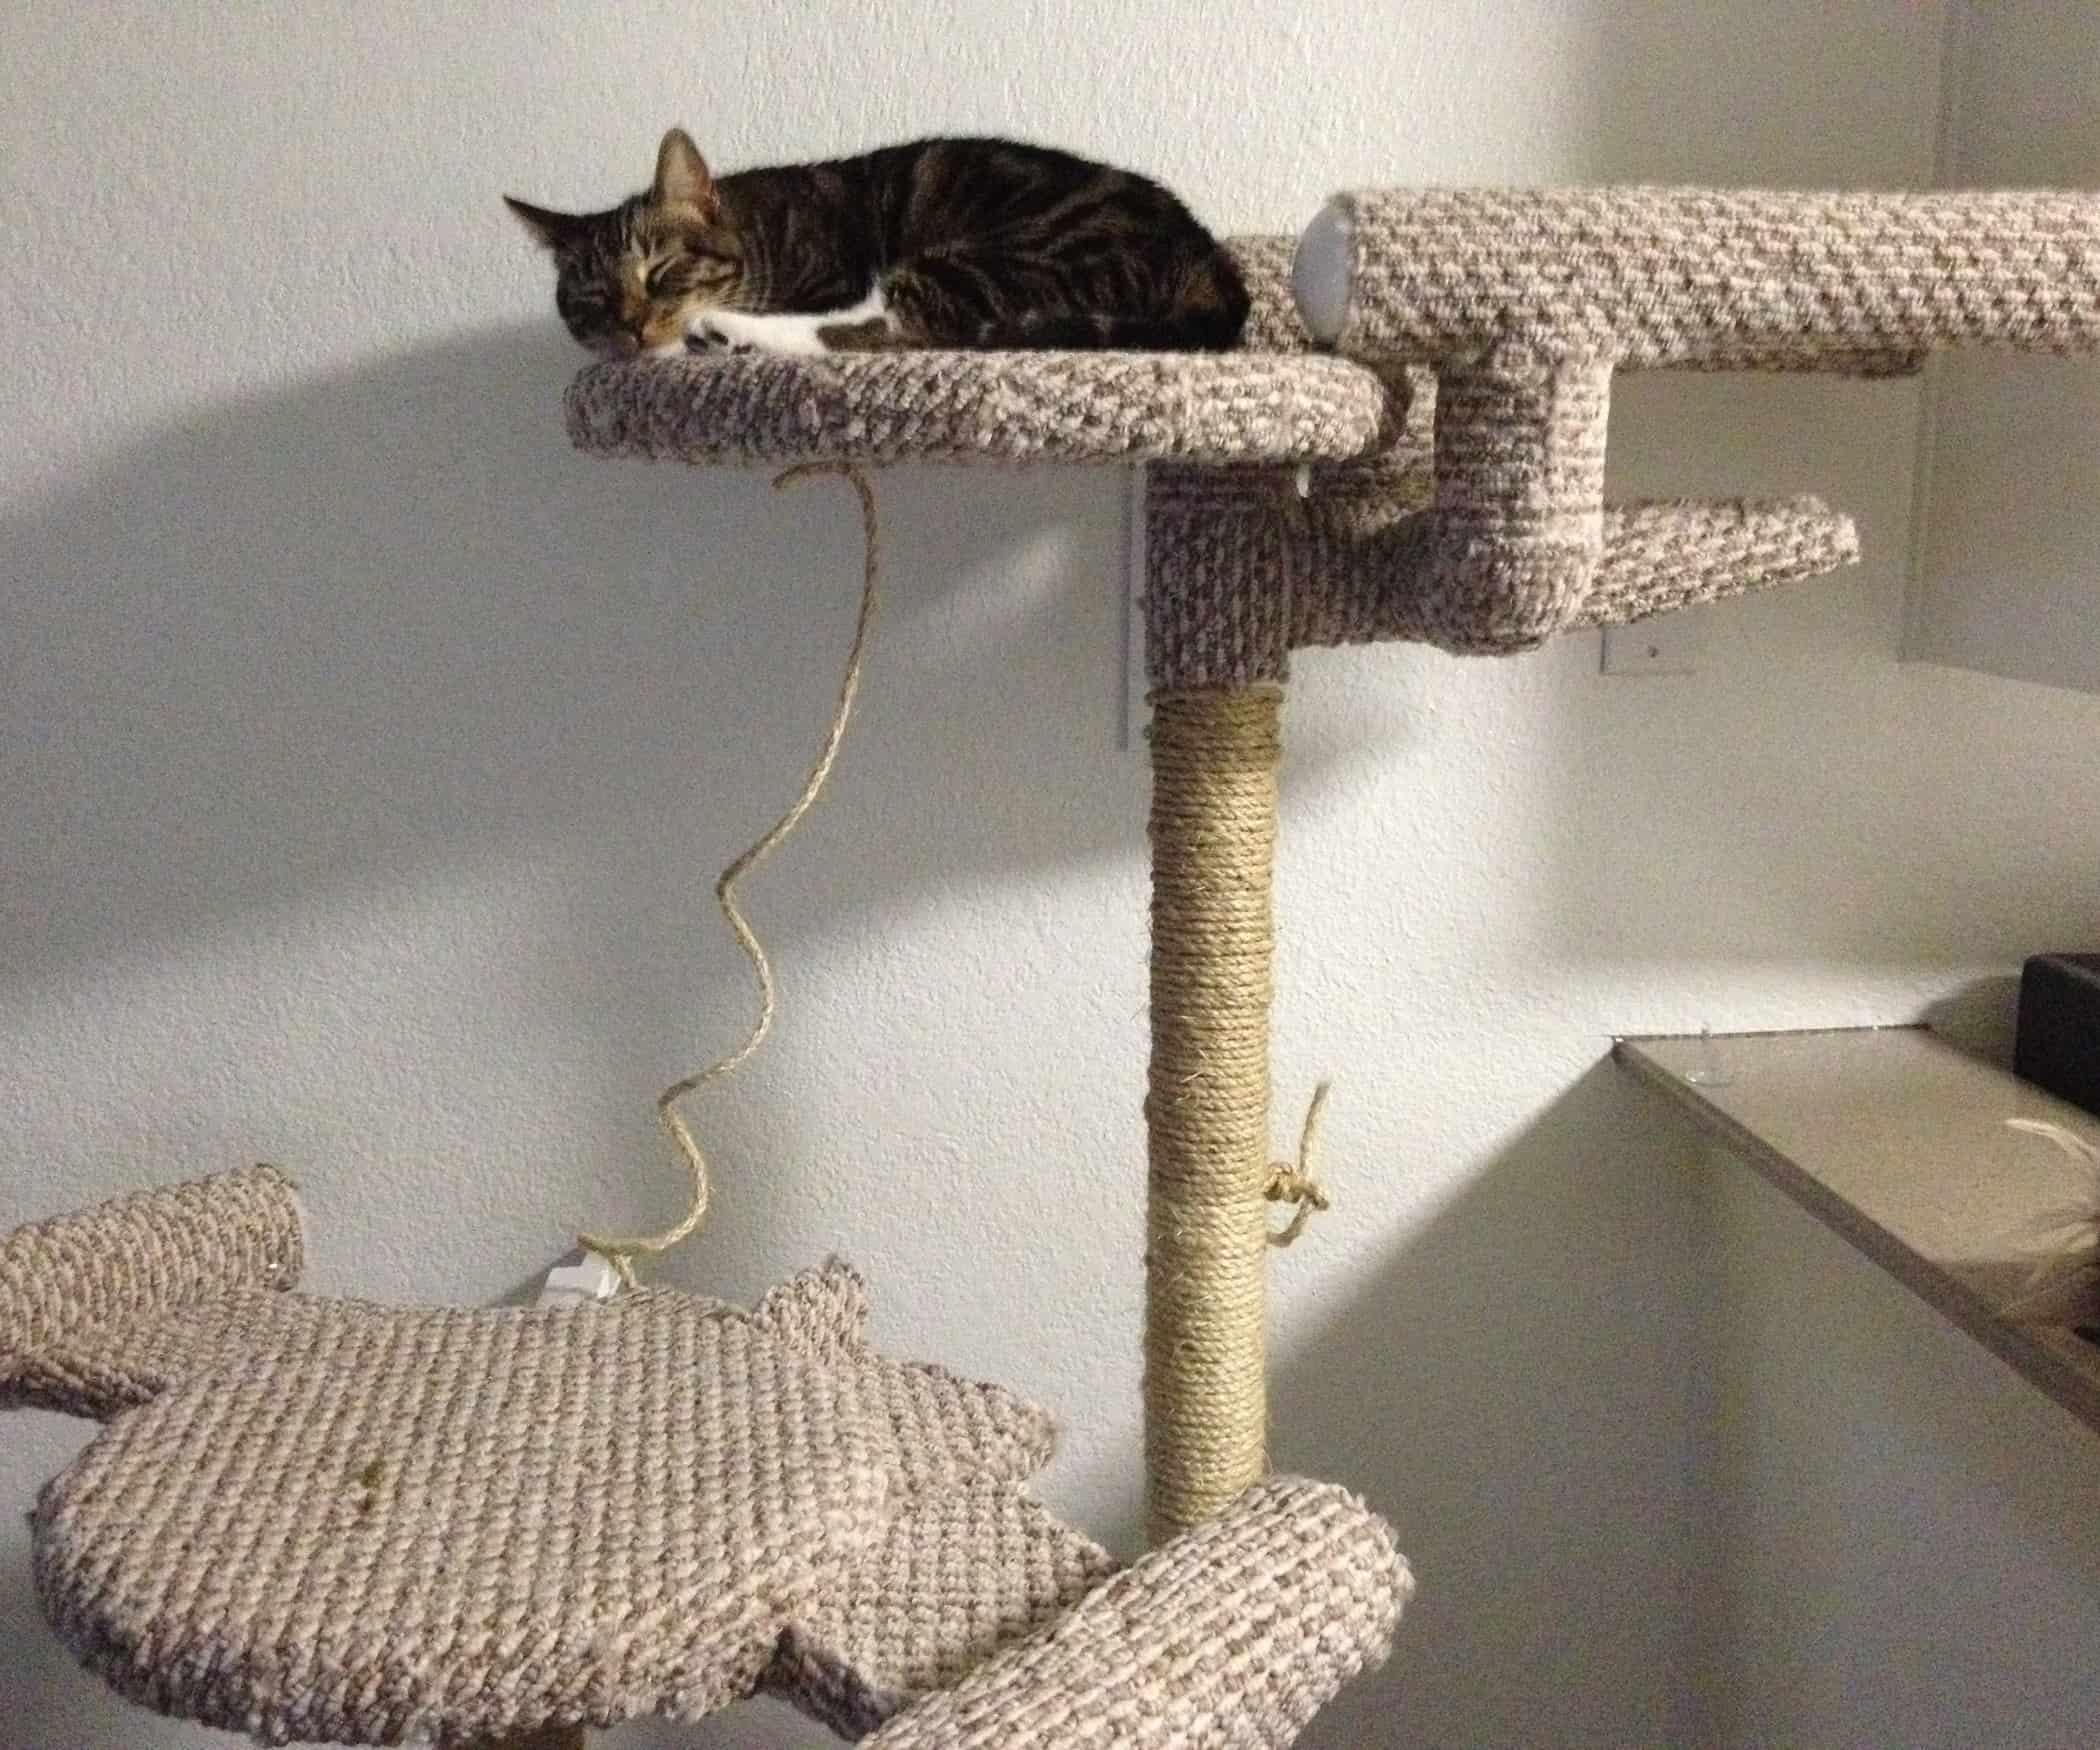 Enterprise shaped cat climber